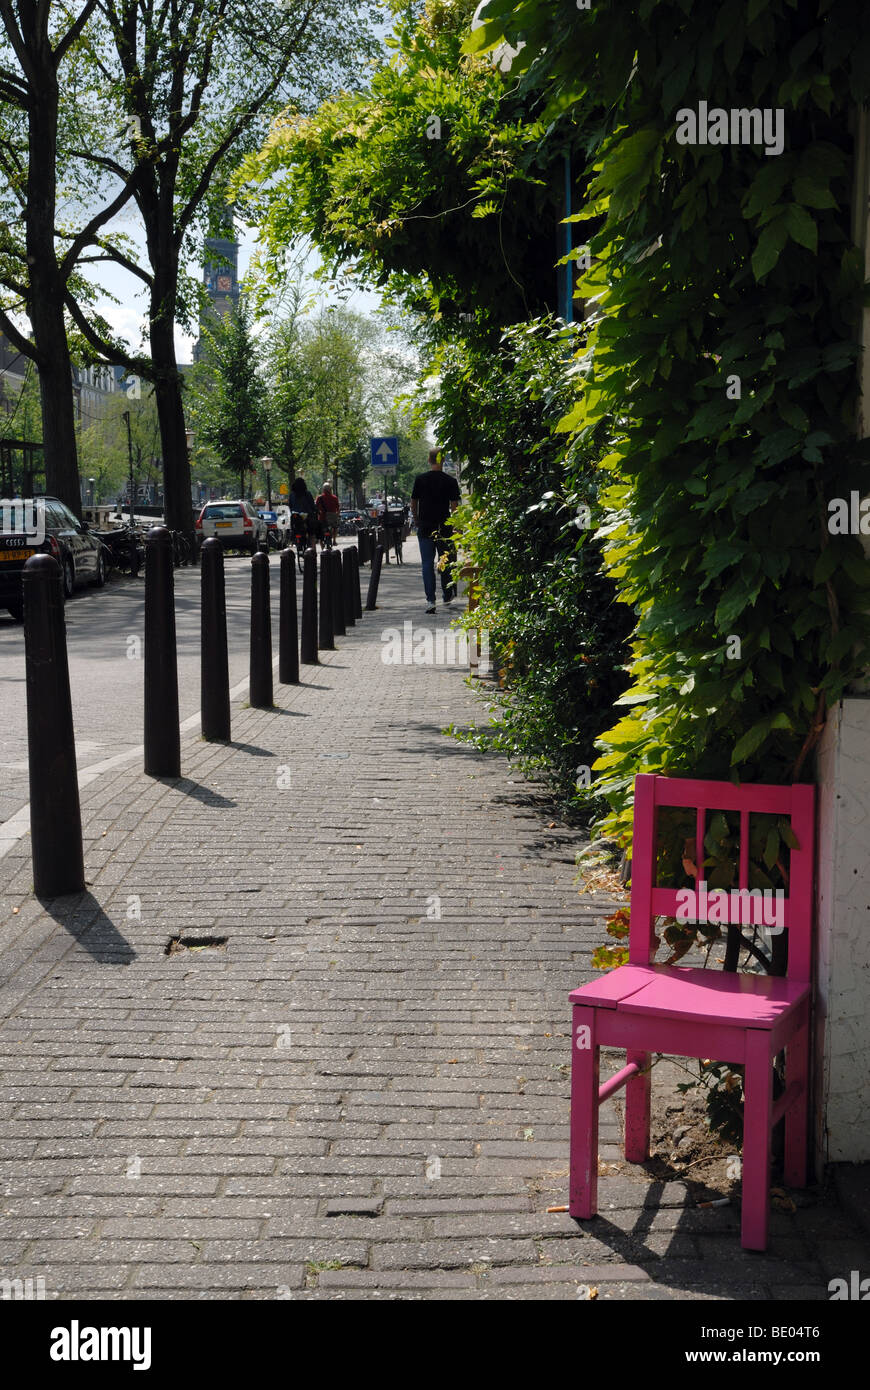 Street furniture - Stock Image